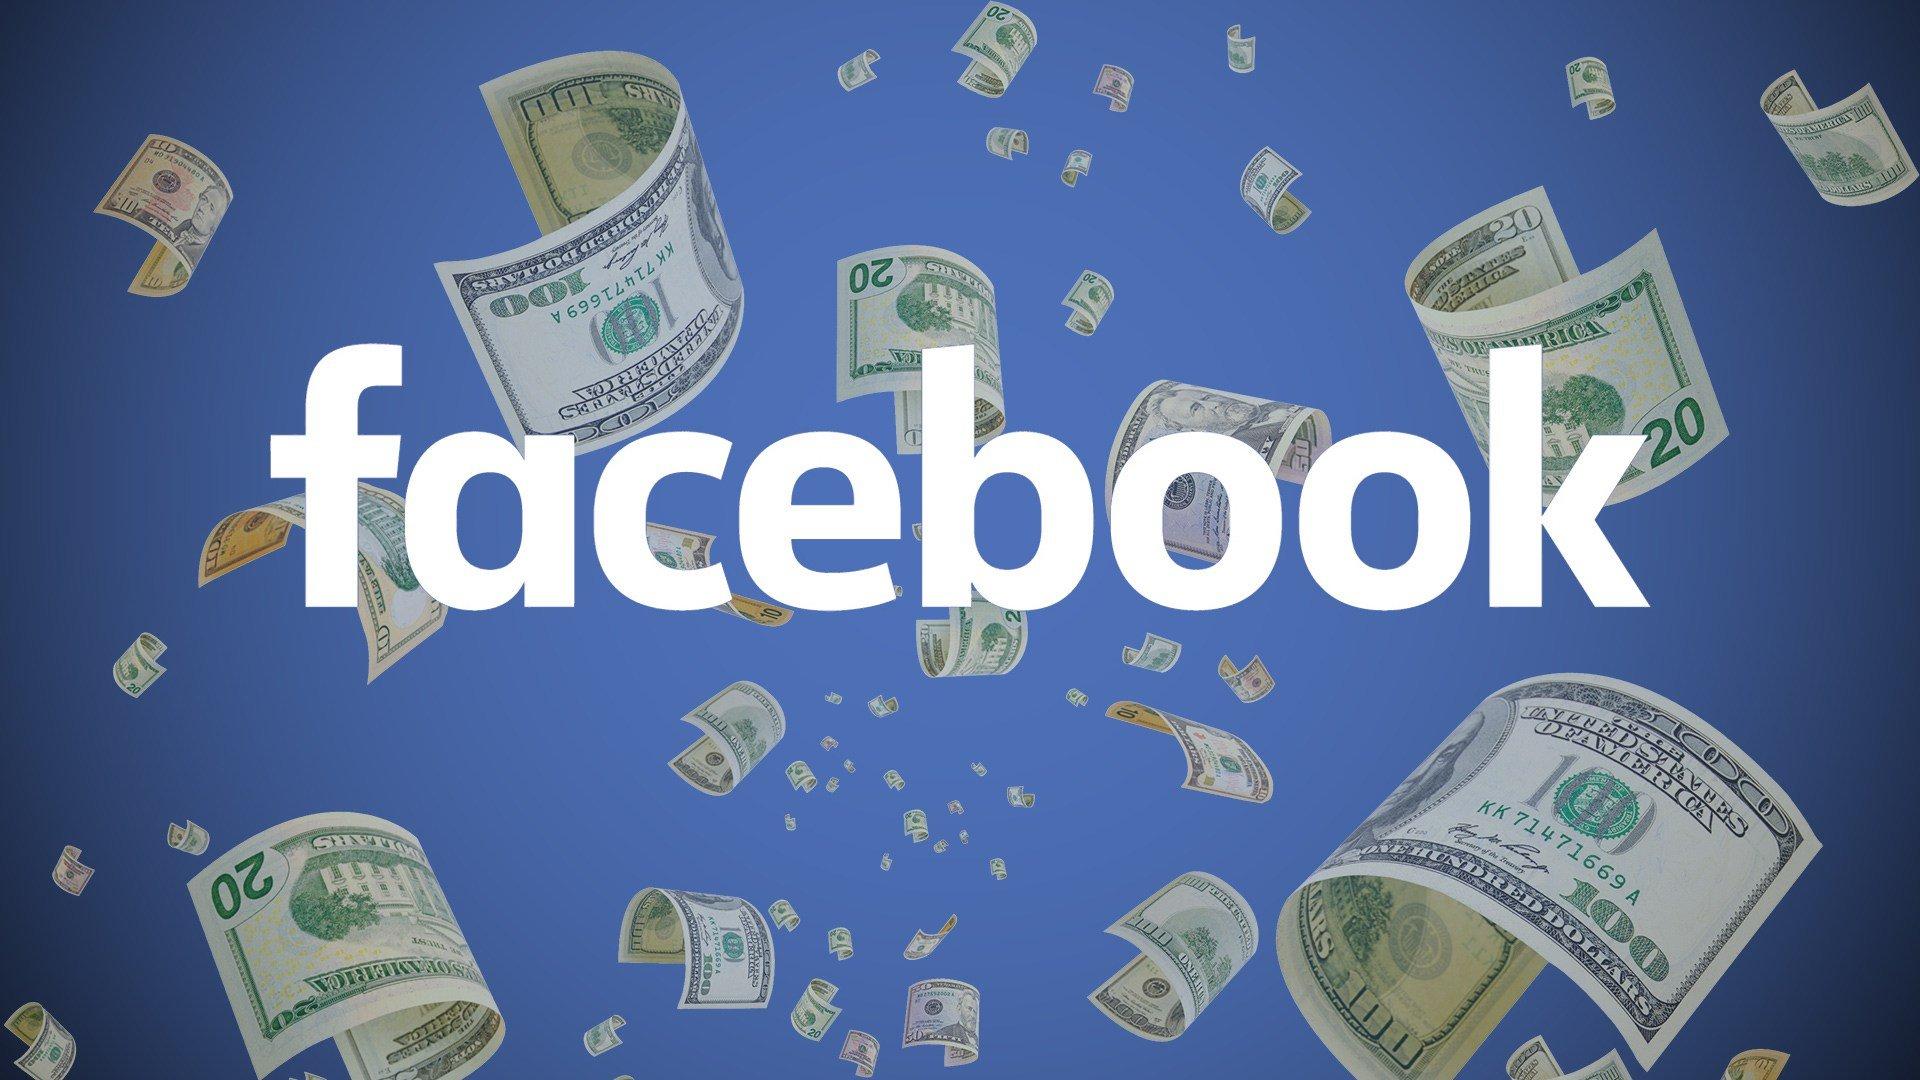 Facebook Loses 70 Billion in Market Value over Last 10 Days